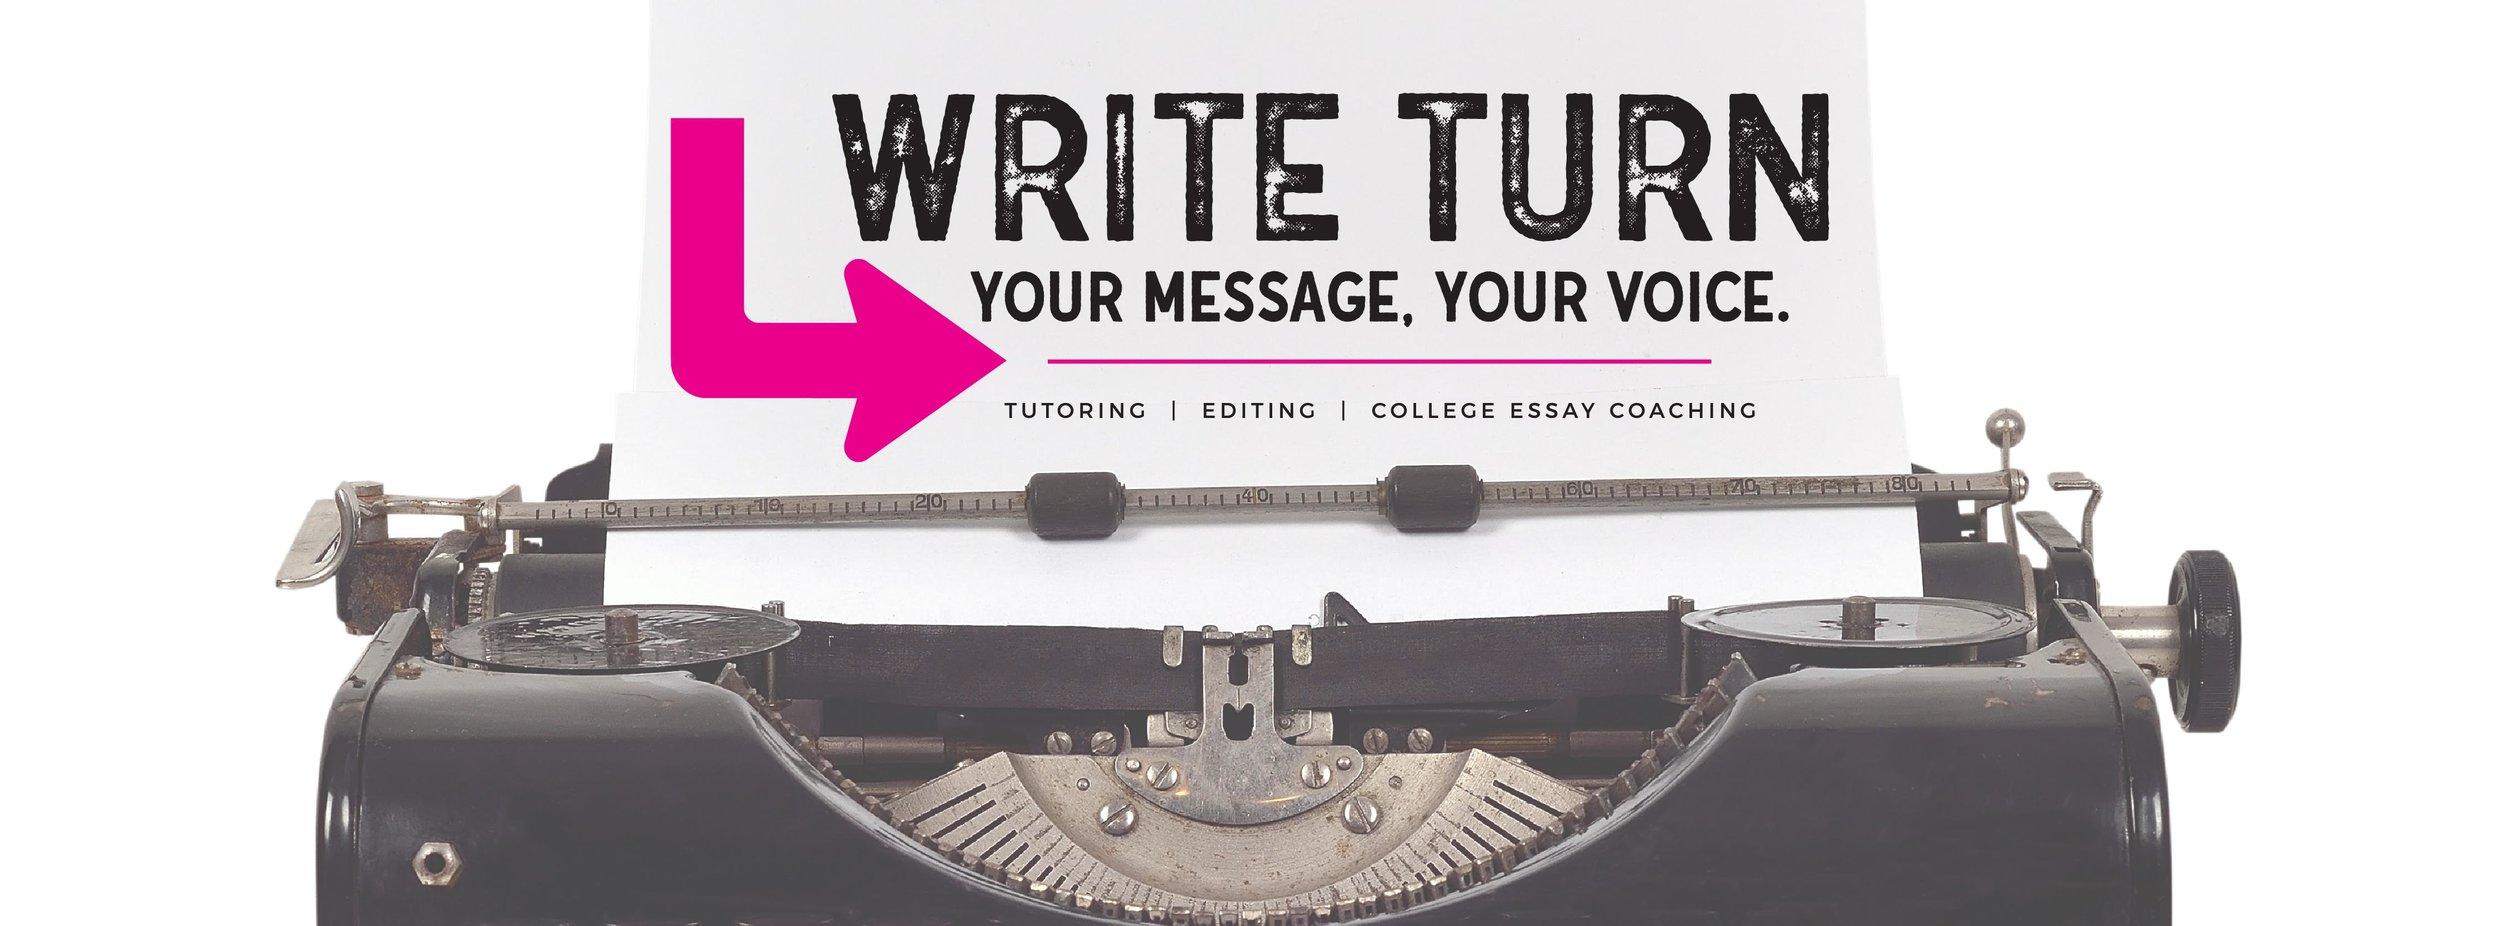 Tutoring and College Essays \u2014 Write Turn